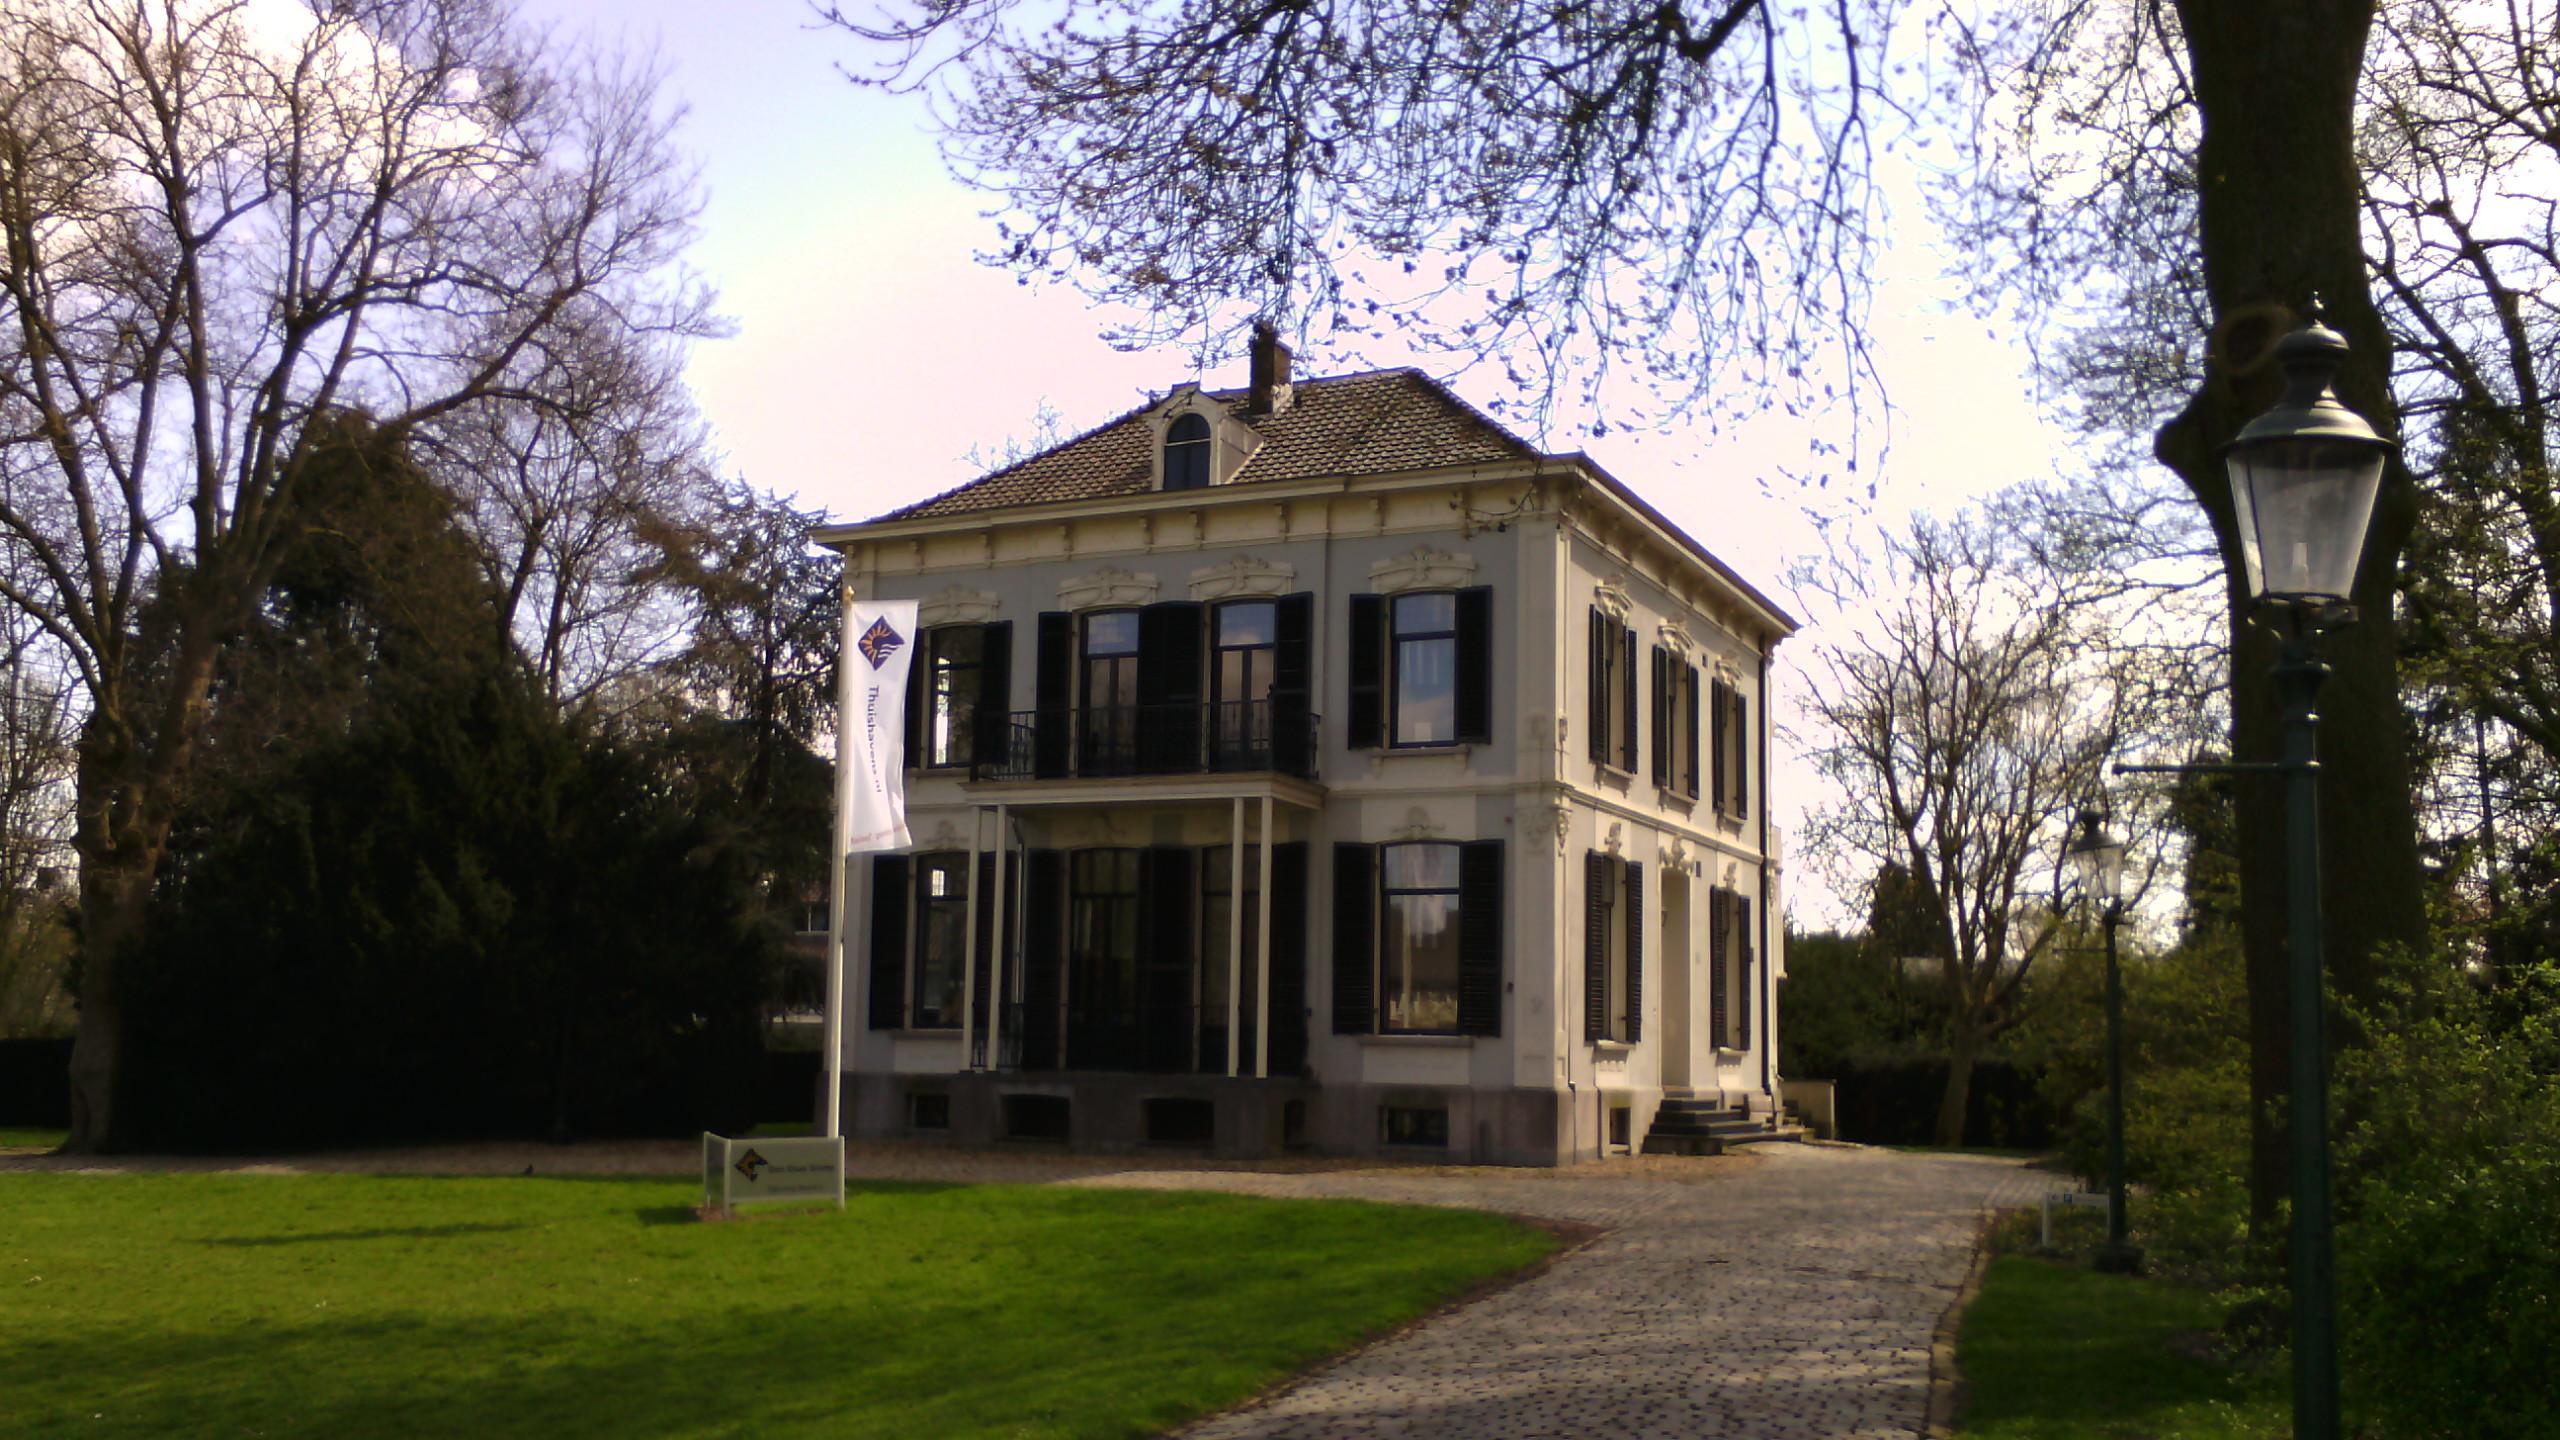 Filerijksweg Noord 2 4 Grote Vierkant Witgepleisterde Villa Villa